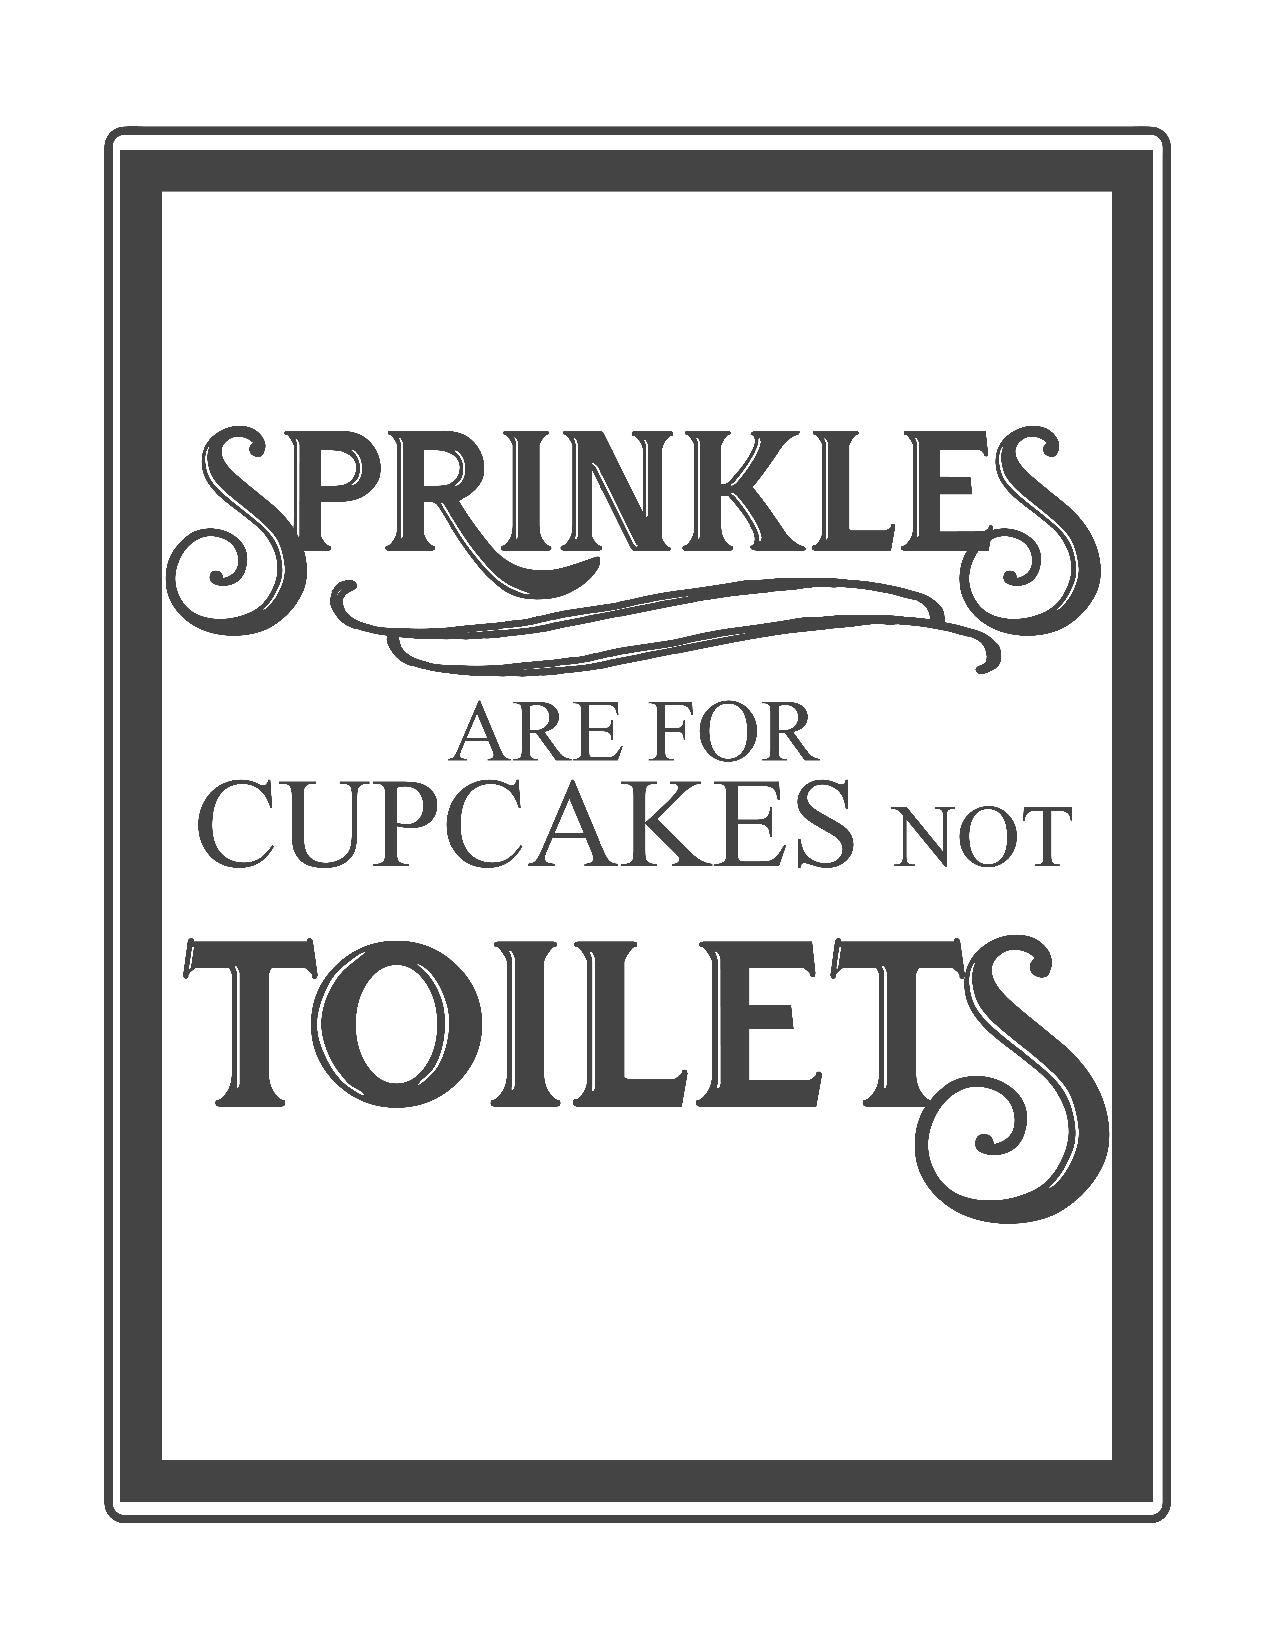 Free Vintage Bathroom Printables | Printables ** | Pinterest - Free Printable No Restroom Signs